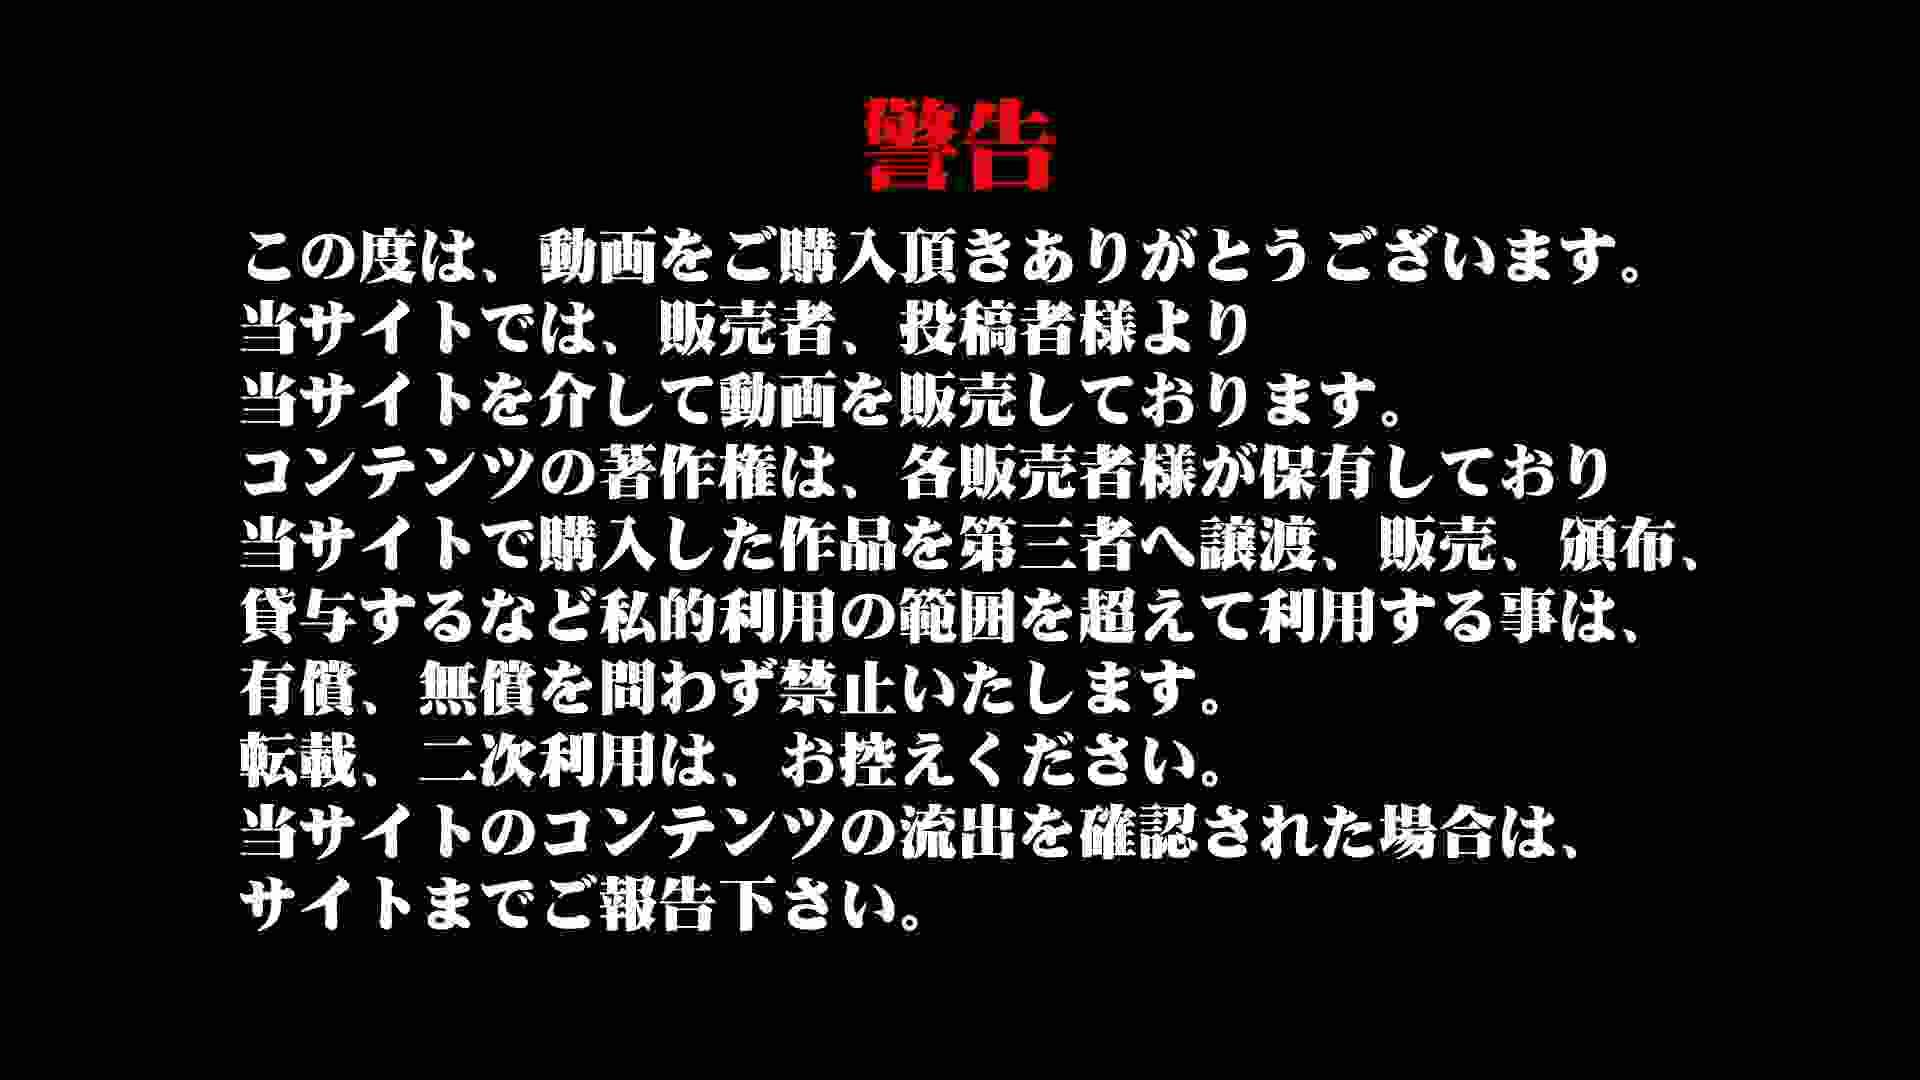 Aquaな露天風呂Vol.894 0 | 露天  67連発 1